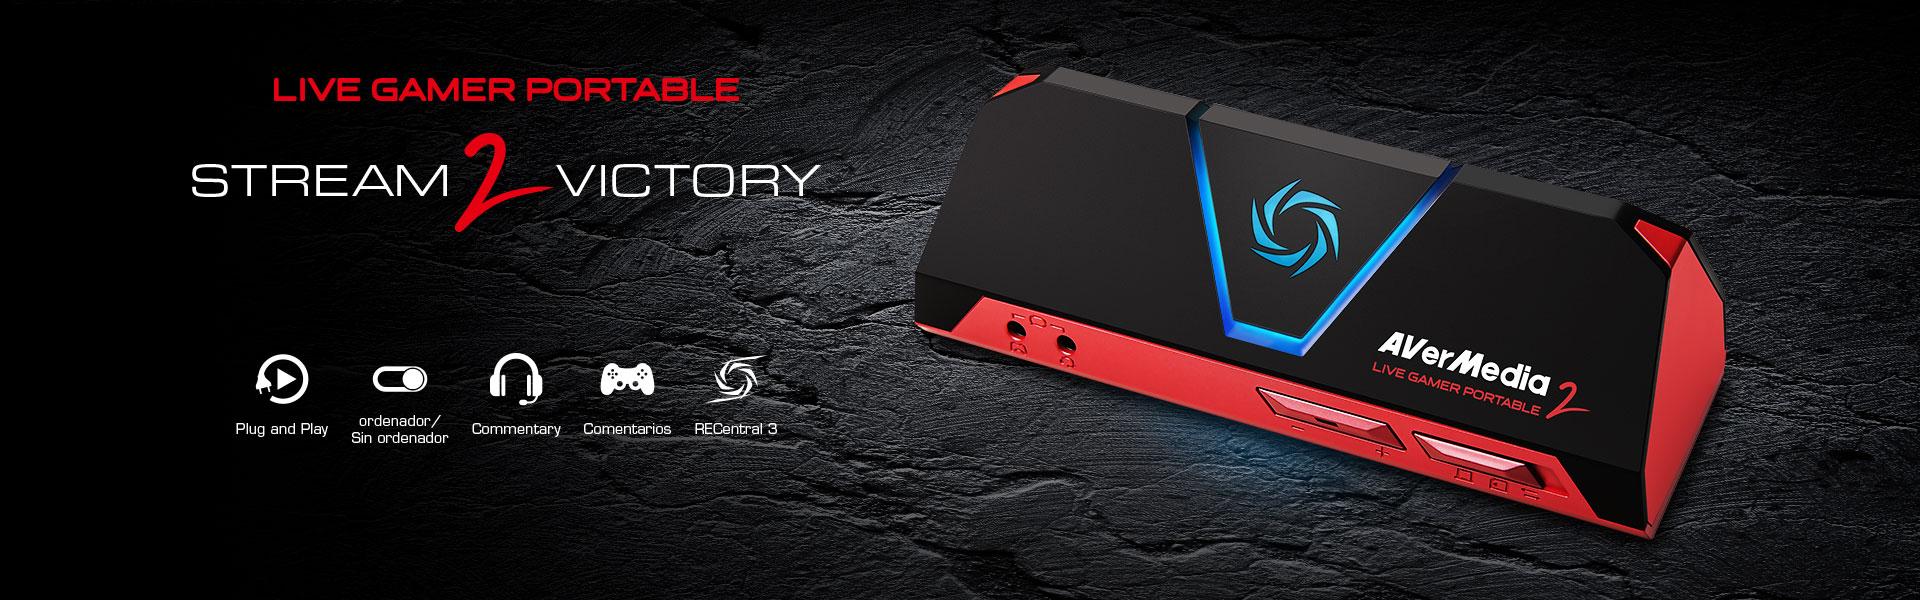 avermedia live gamer portable 2 capturadora. Black Bedroom Furniture Sets. Home Design Ideas